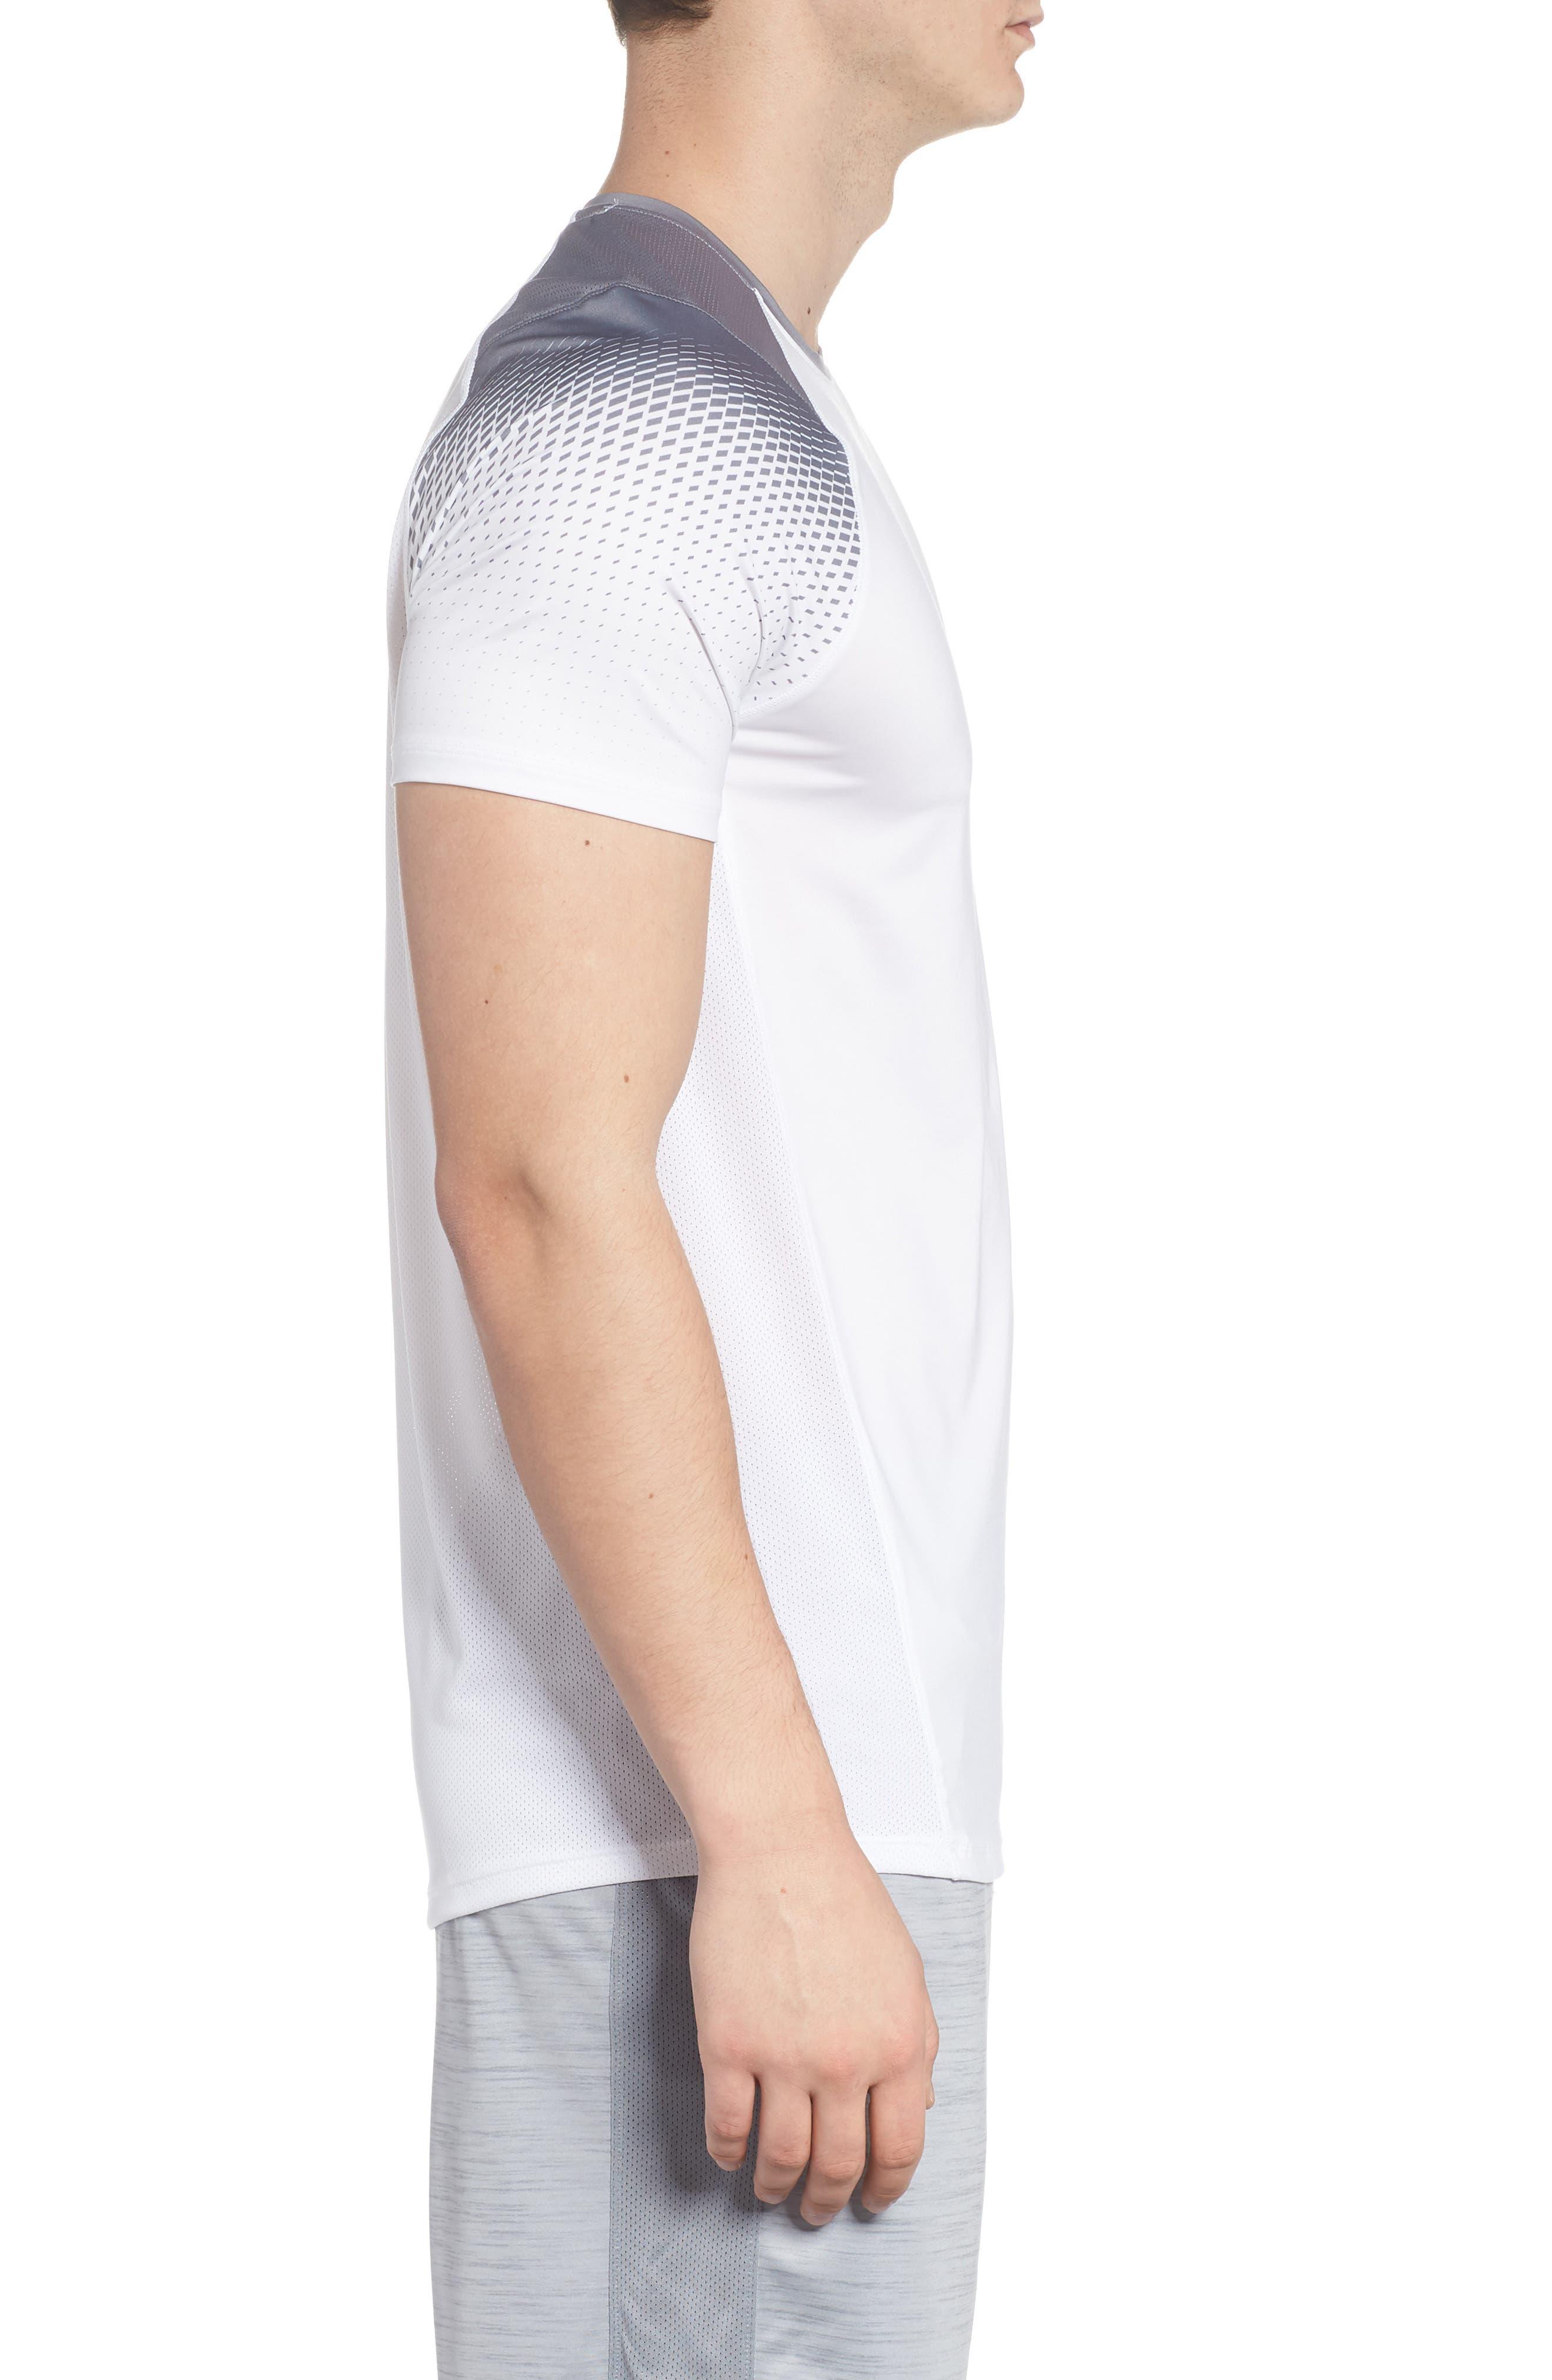 MK1 Dash Print Crewneck T-Shirt,                             Alternate thumbnail 3, color,                             WHITE / ZINC GREH / GRAPHITE